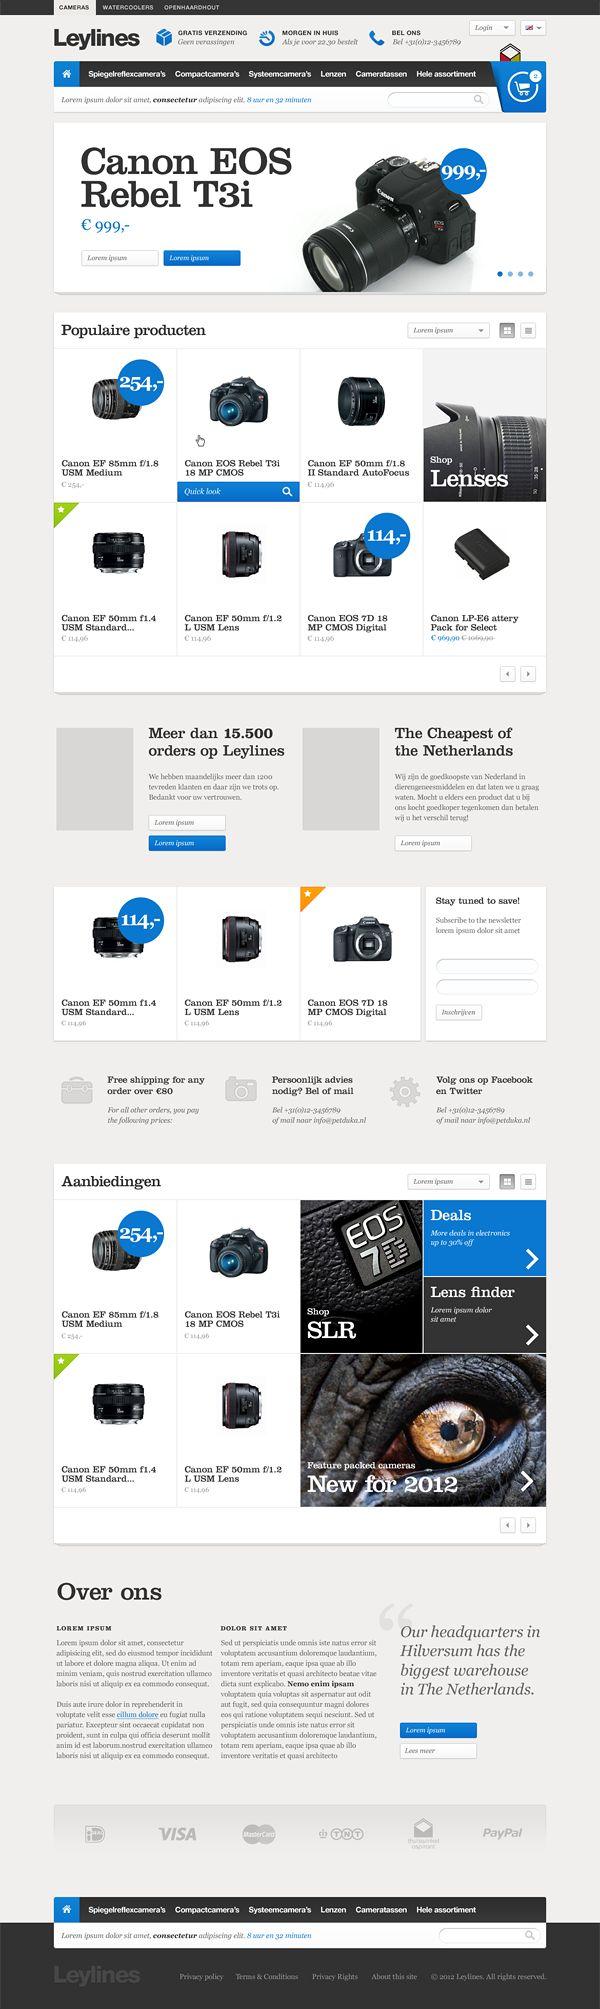 Leylines on Behance #webdesign #webdesign, #design, #responsivedesign, #website, #ux, #ui, #mobile, responsive design, web design #userinterface #app #gui